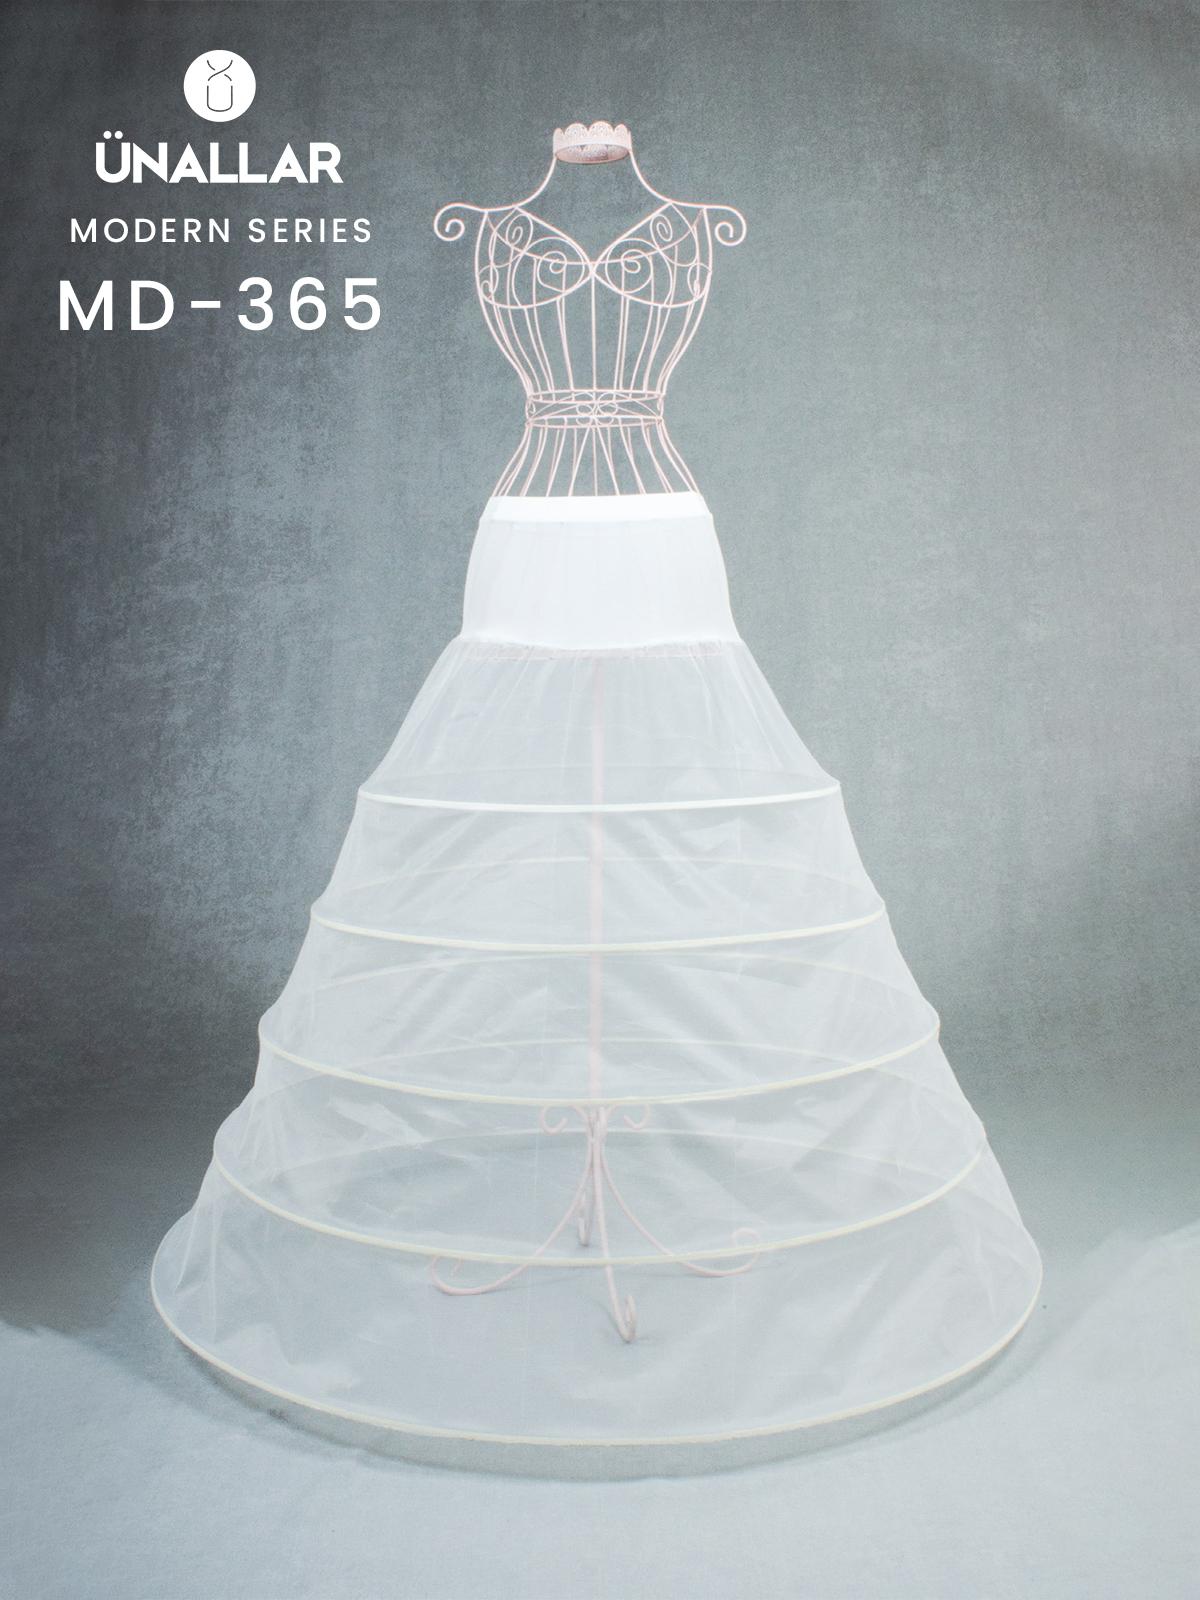 md-365